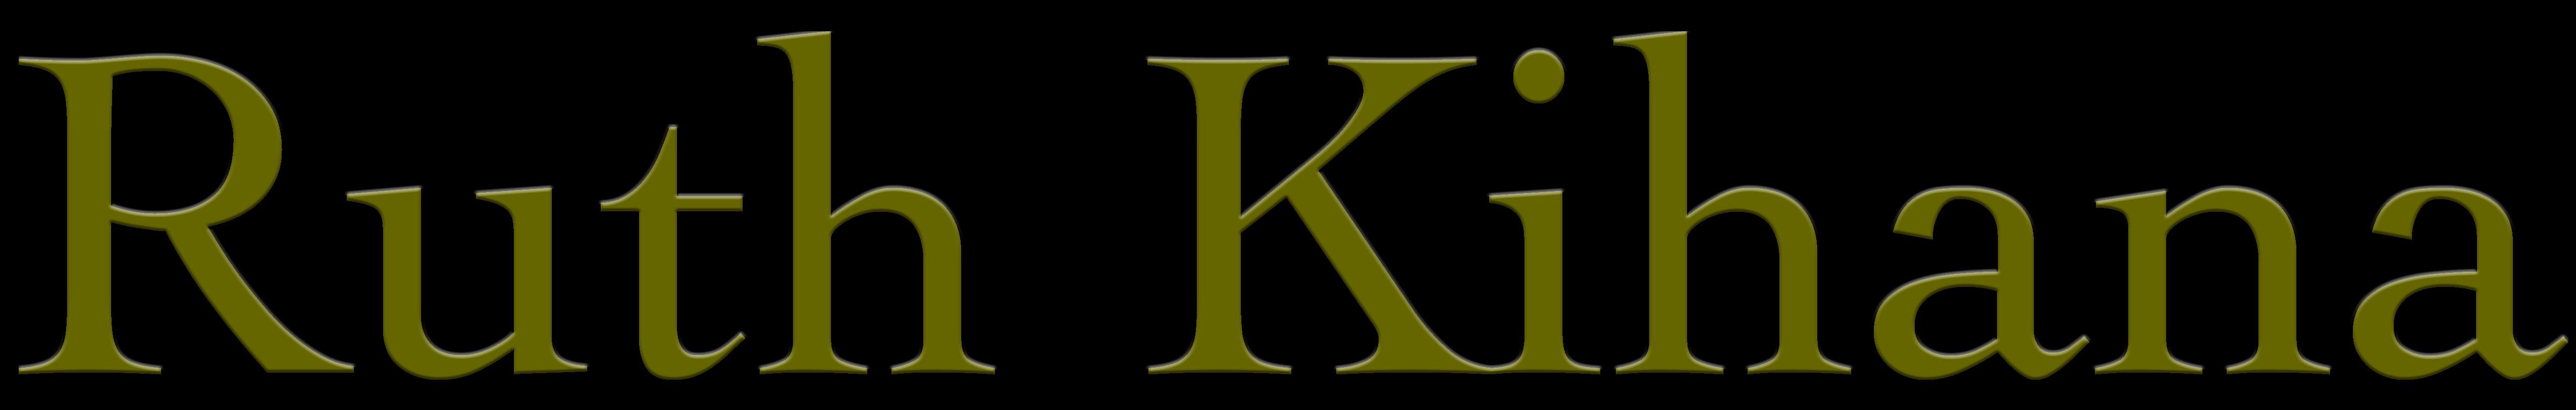 a Japanese Singer Songwriter Ruth Kihana - Website Logo (シンガーソングライター ルース・キハナのウェブサイトロゴ)